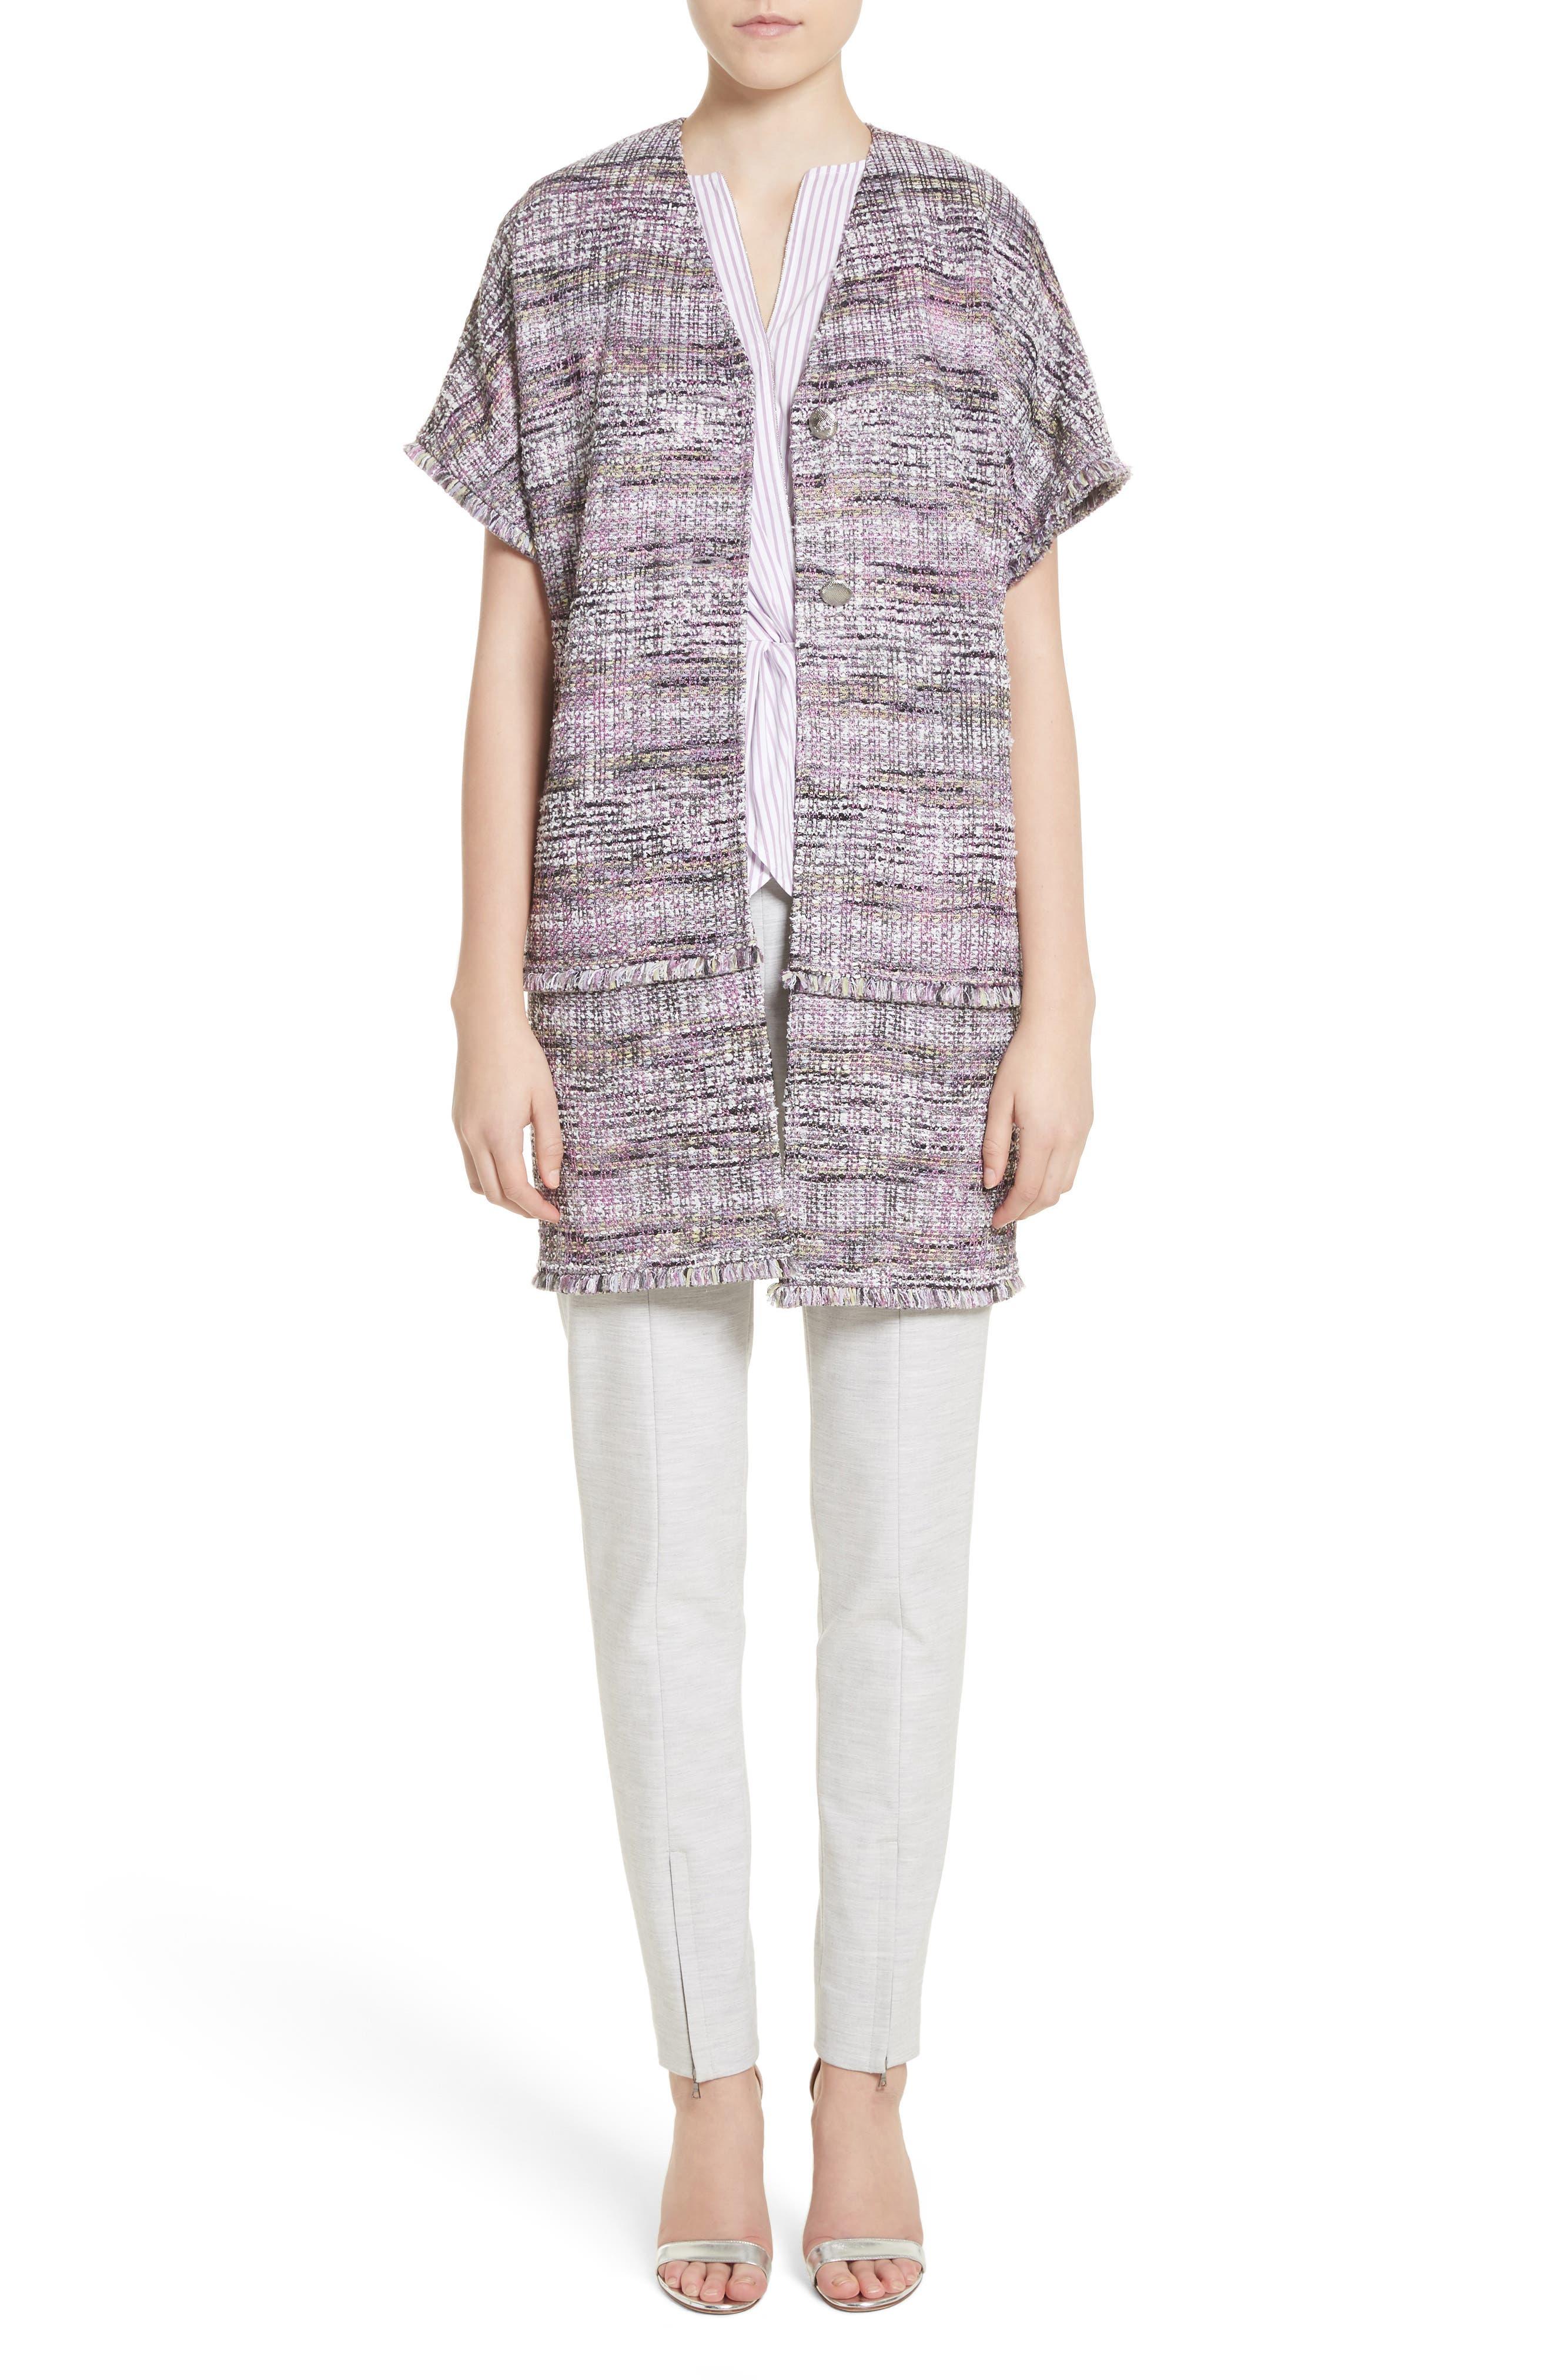 Summer Bella Double Weave Pants,                             Alternate thumbnail 12, color,                             Light Grey Melange